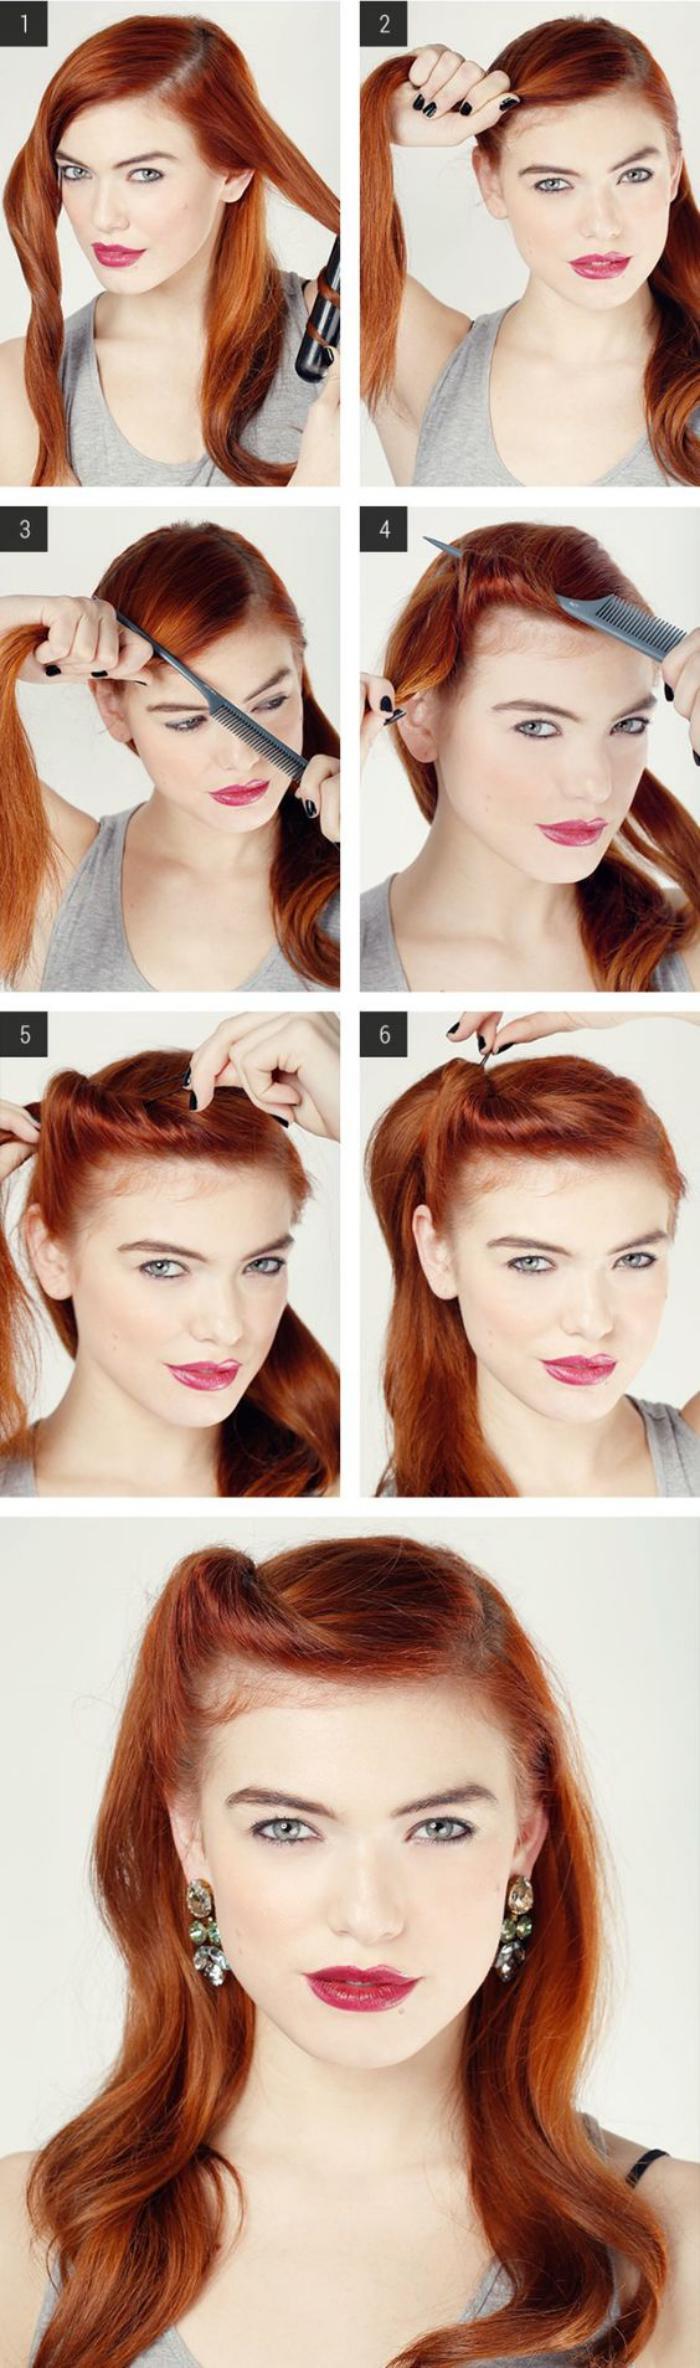 coiffure-pin-up-savoir-faire-coiffure-vintage